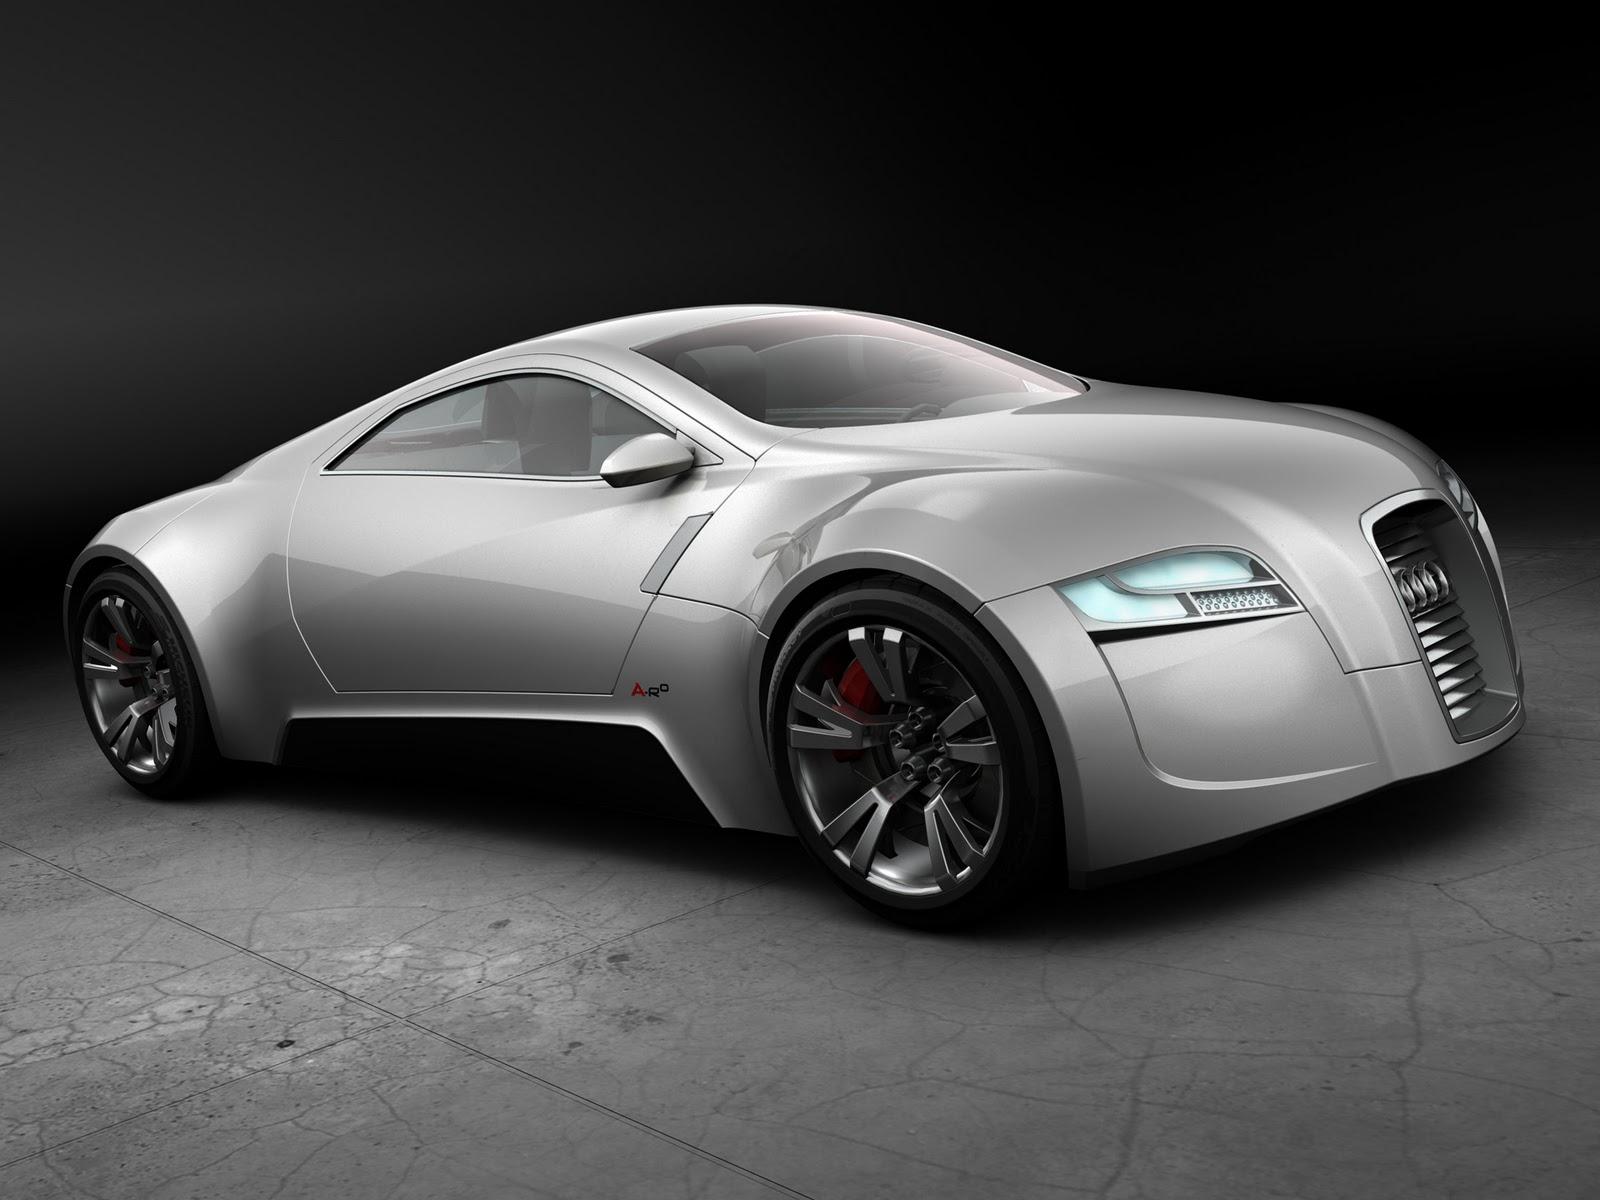 http://2.bp.blogspot.com/_7XKM5uAPfD8/THukLEgJDuI/AAAAAAAAALA/LSLiVVny5hY/s1600/2006-Audi-R-Zero-Concept-Silver-SA-1920x1440.jpg